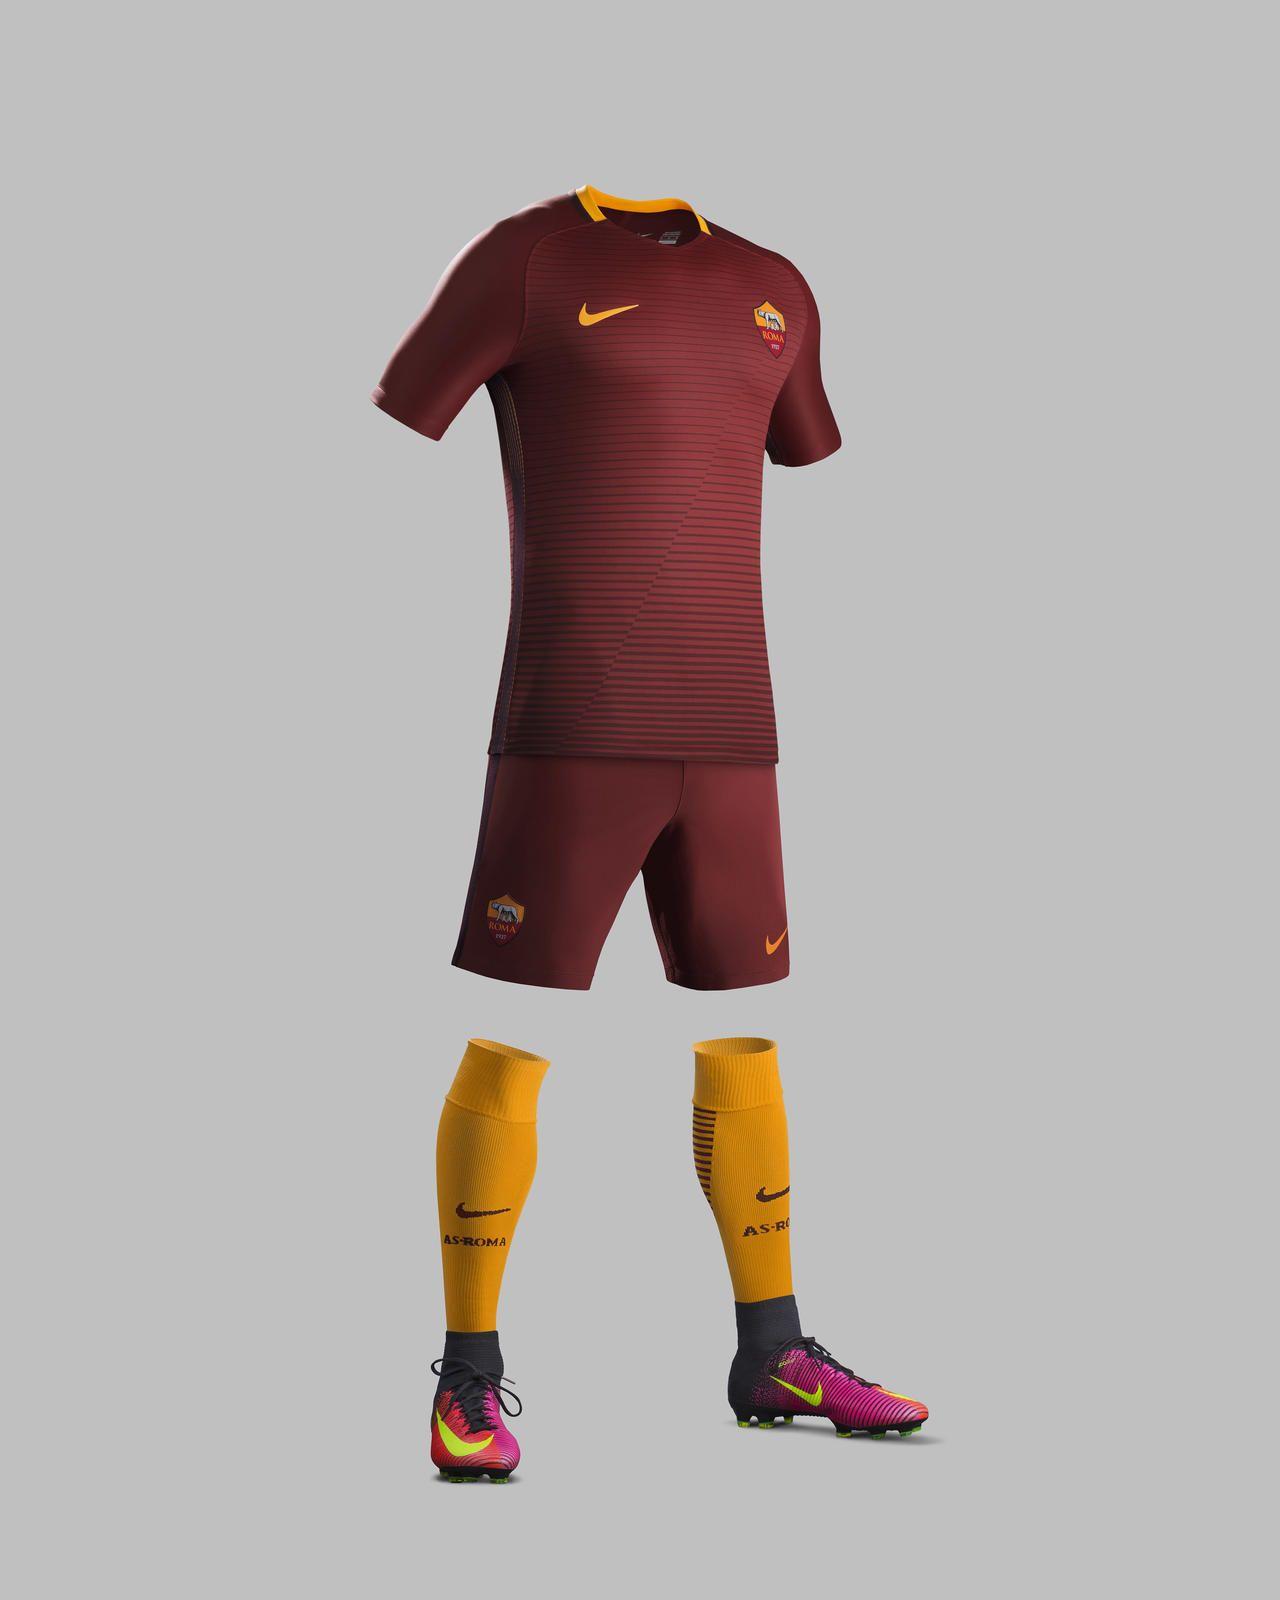 8005237aa4c3f Camisas da AS Roma 2016-2017 Nike kit